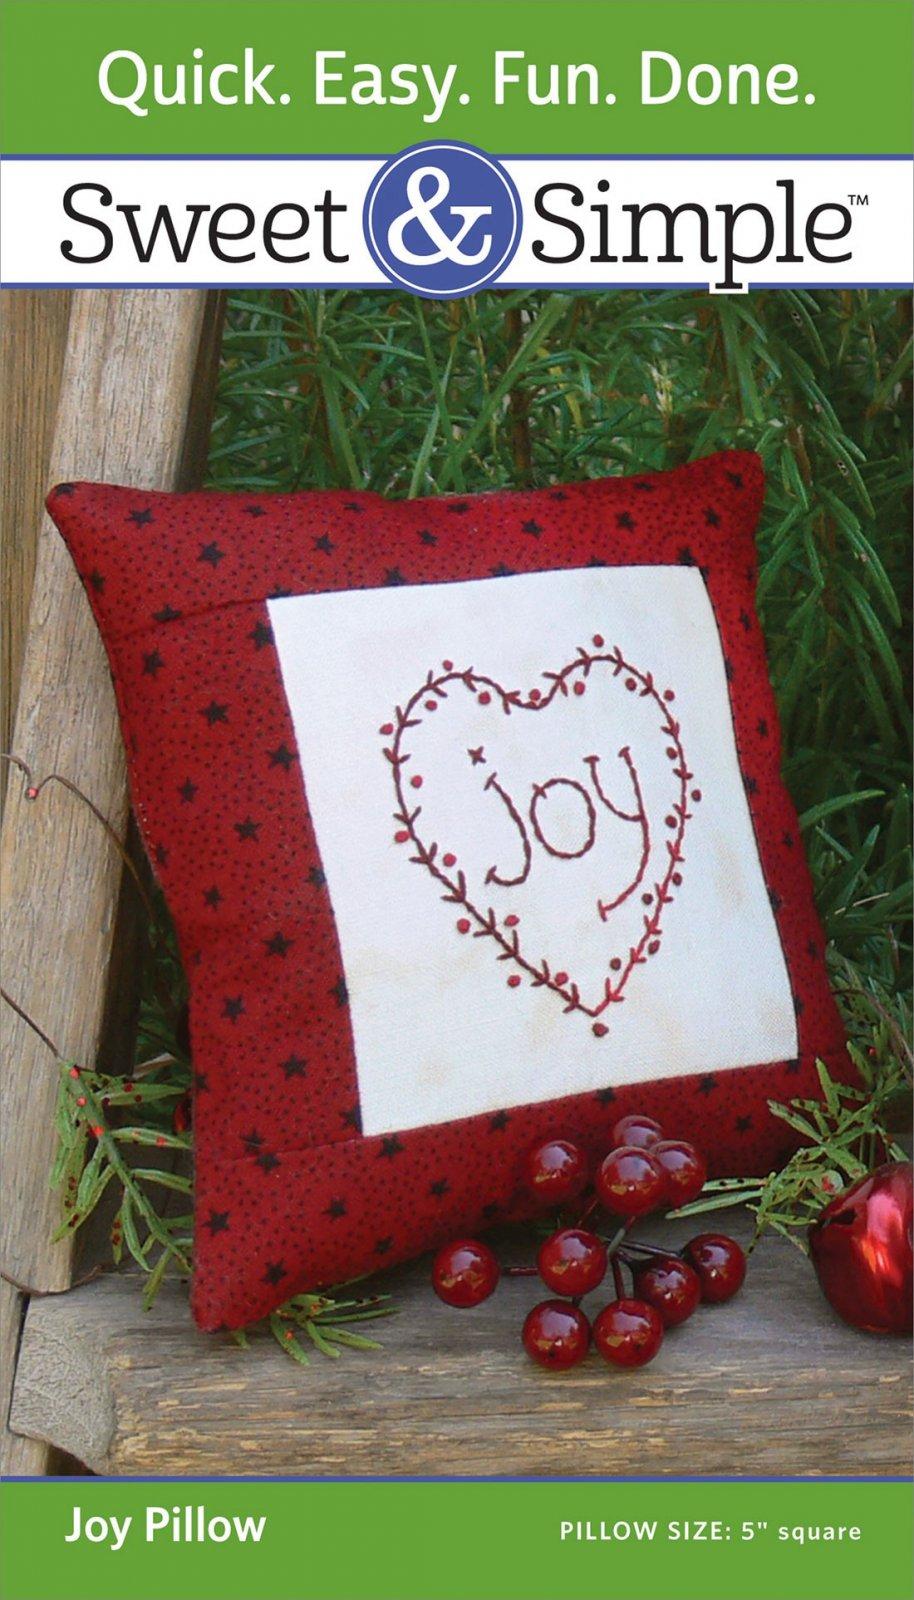 Sweet & Simple - Joy Pillow Pattern Pack